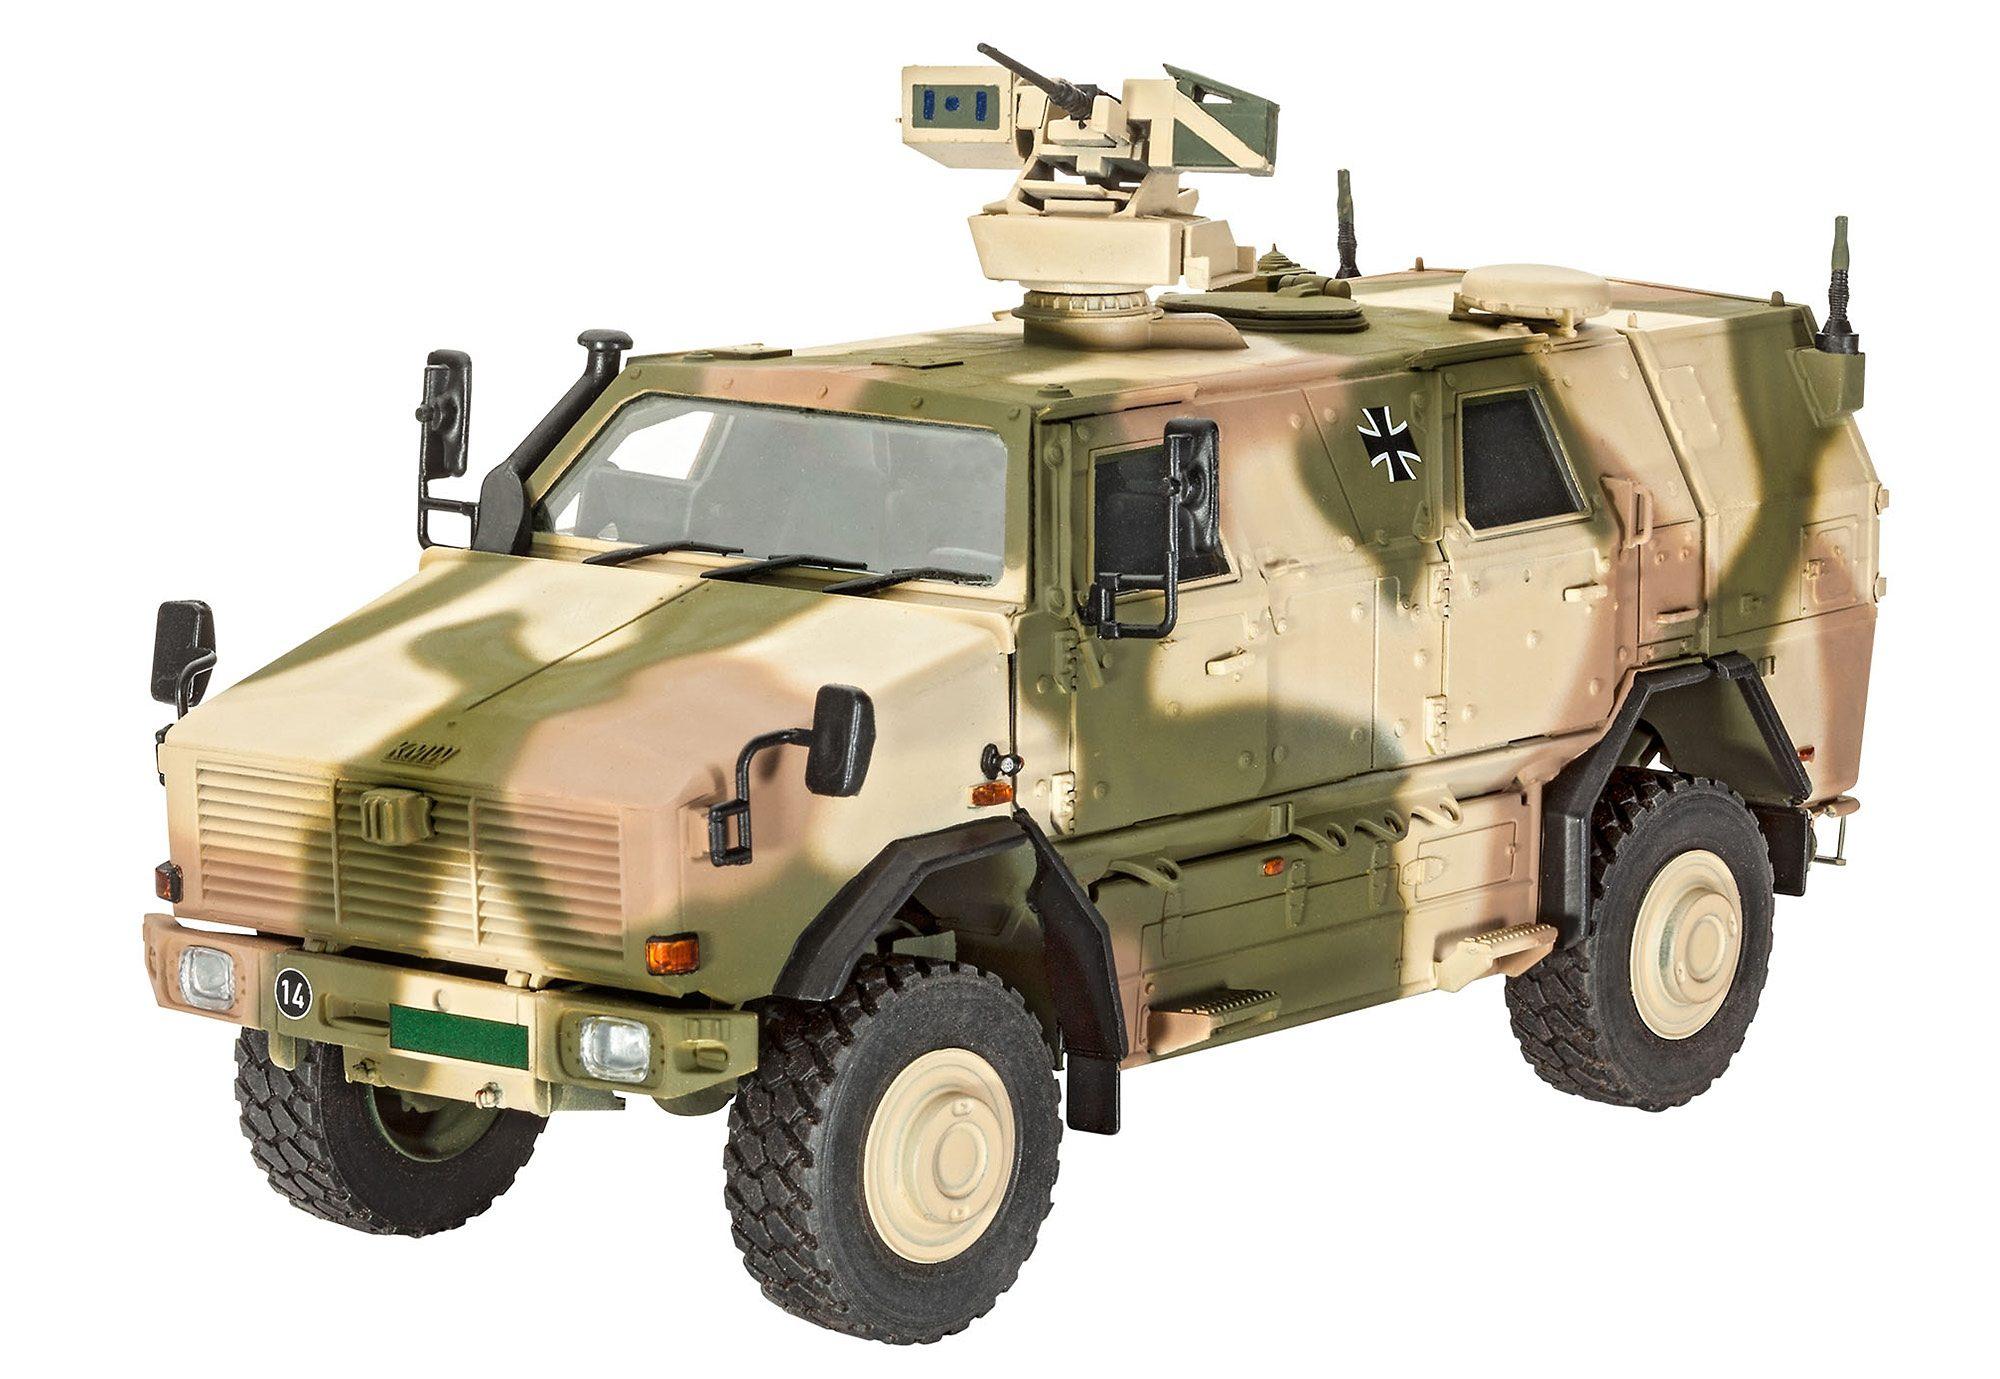 Revell® Modellbausatz Bundeswehrfahrzeug, »Dingo 2 GE A3.3 PatSi«, Maßstab 1:35